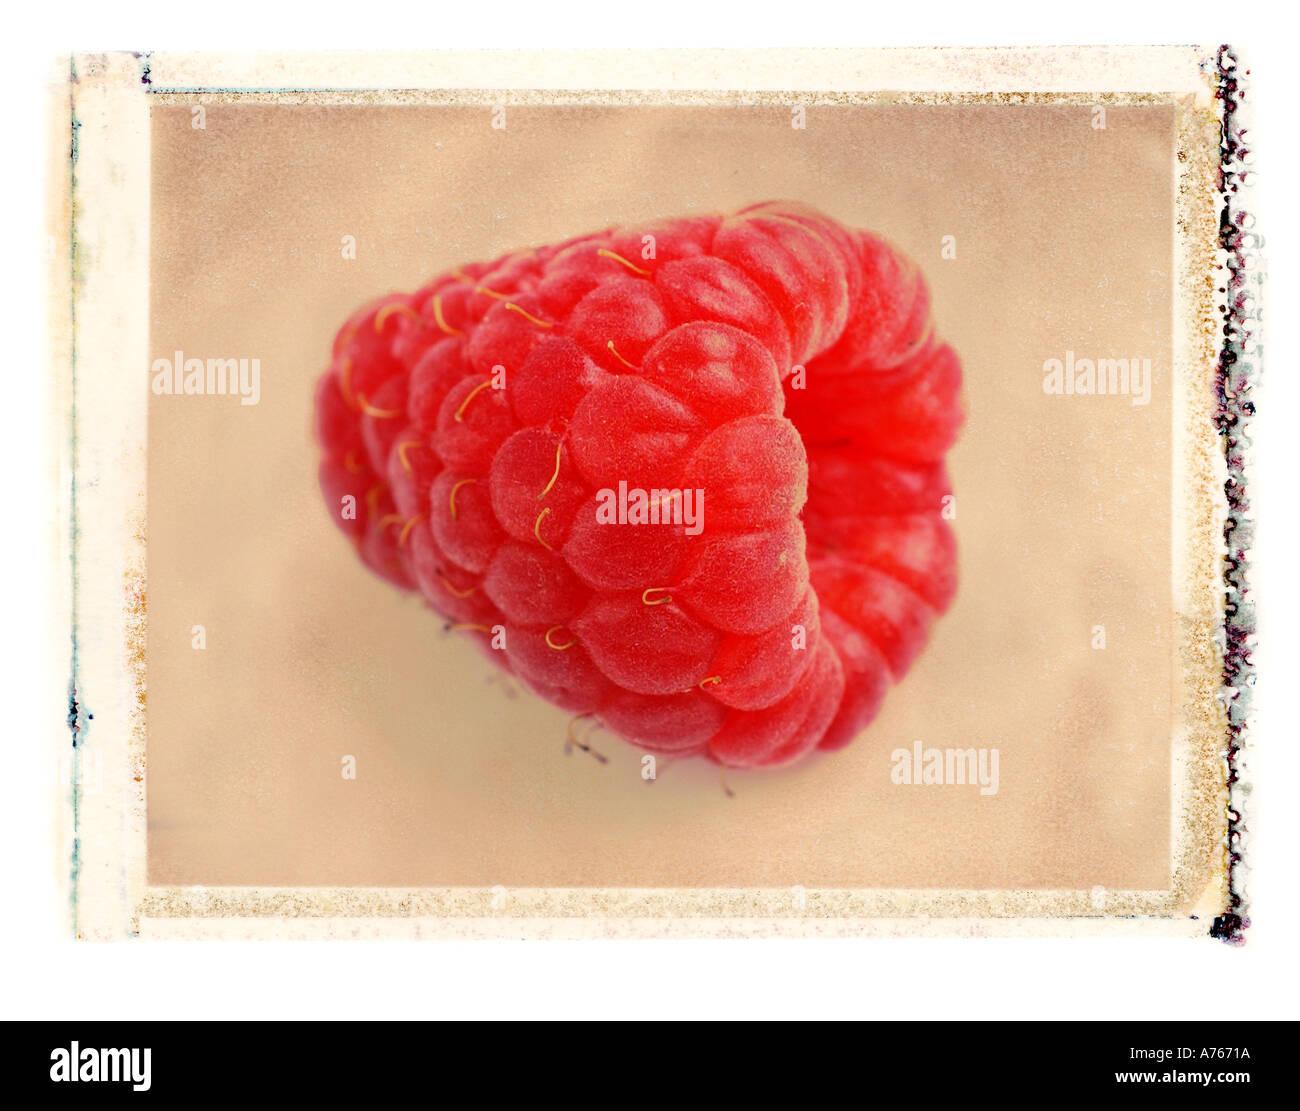 Red Raspberry - Stock Image